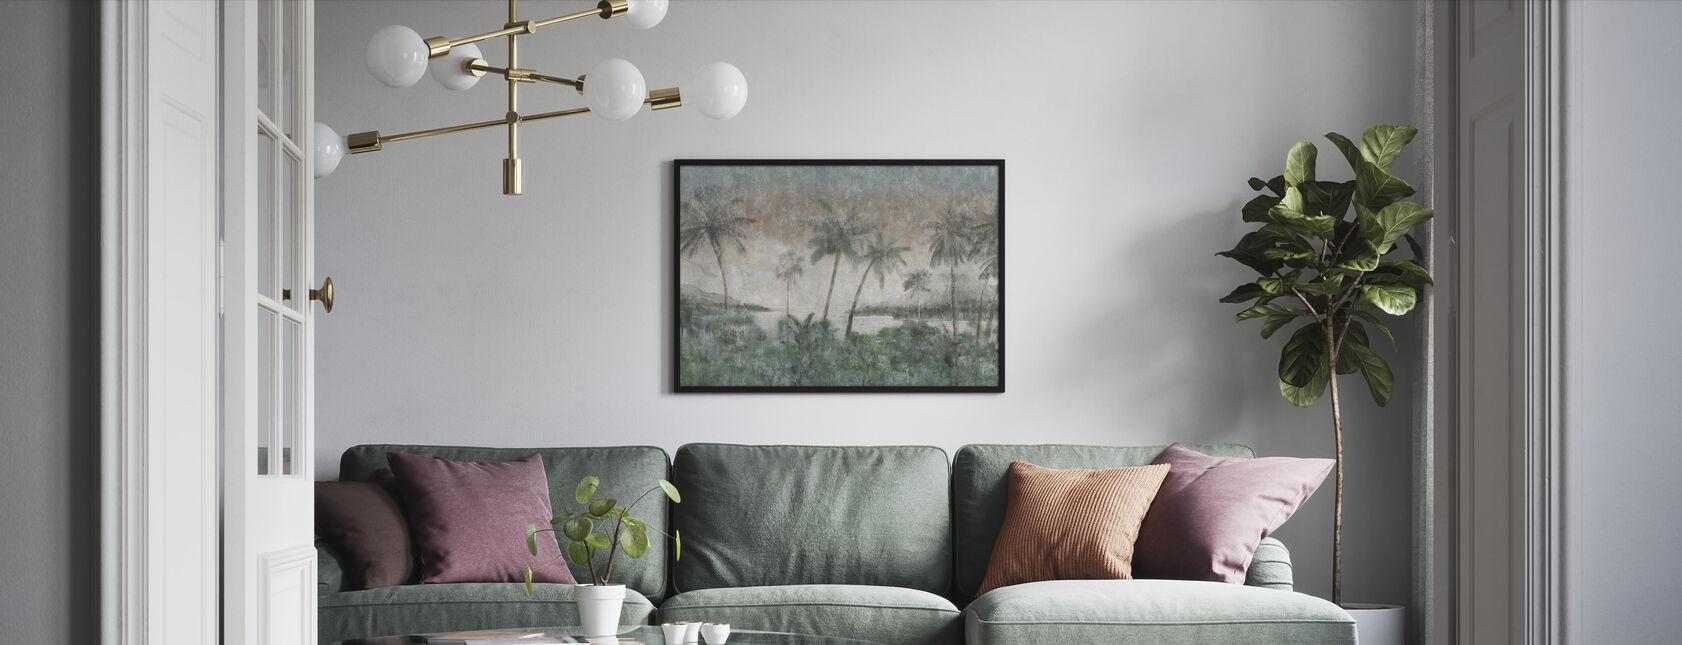 Waikiki - Inramad tavla - Vardagsrum